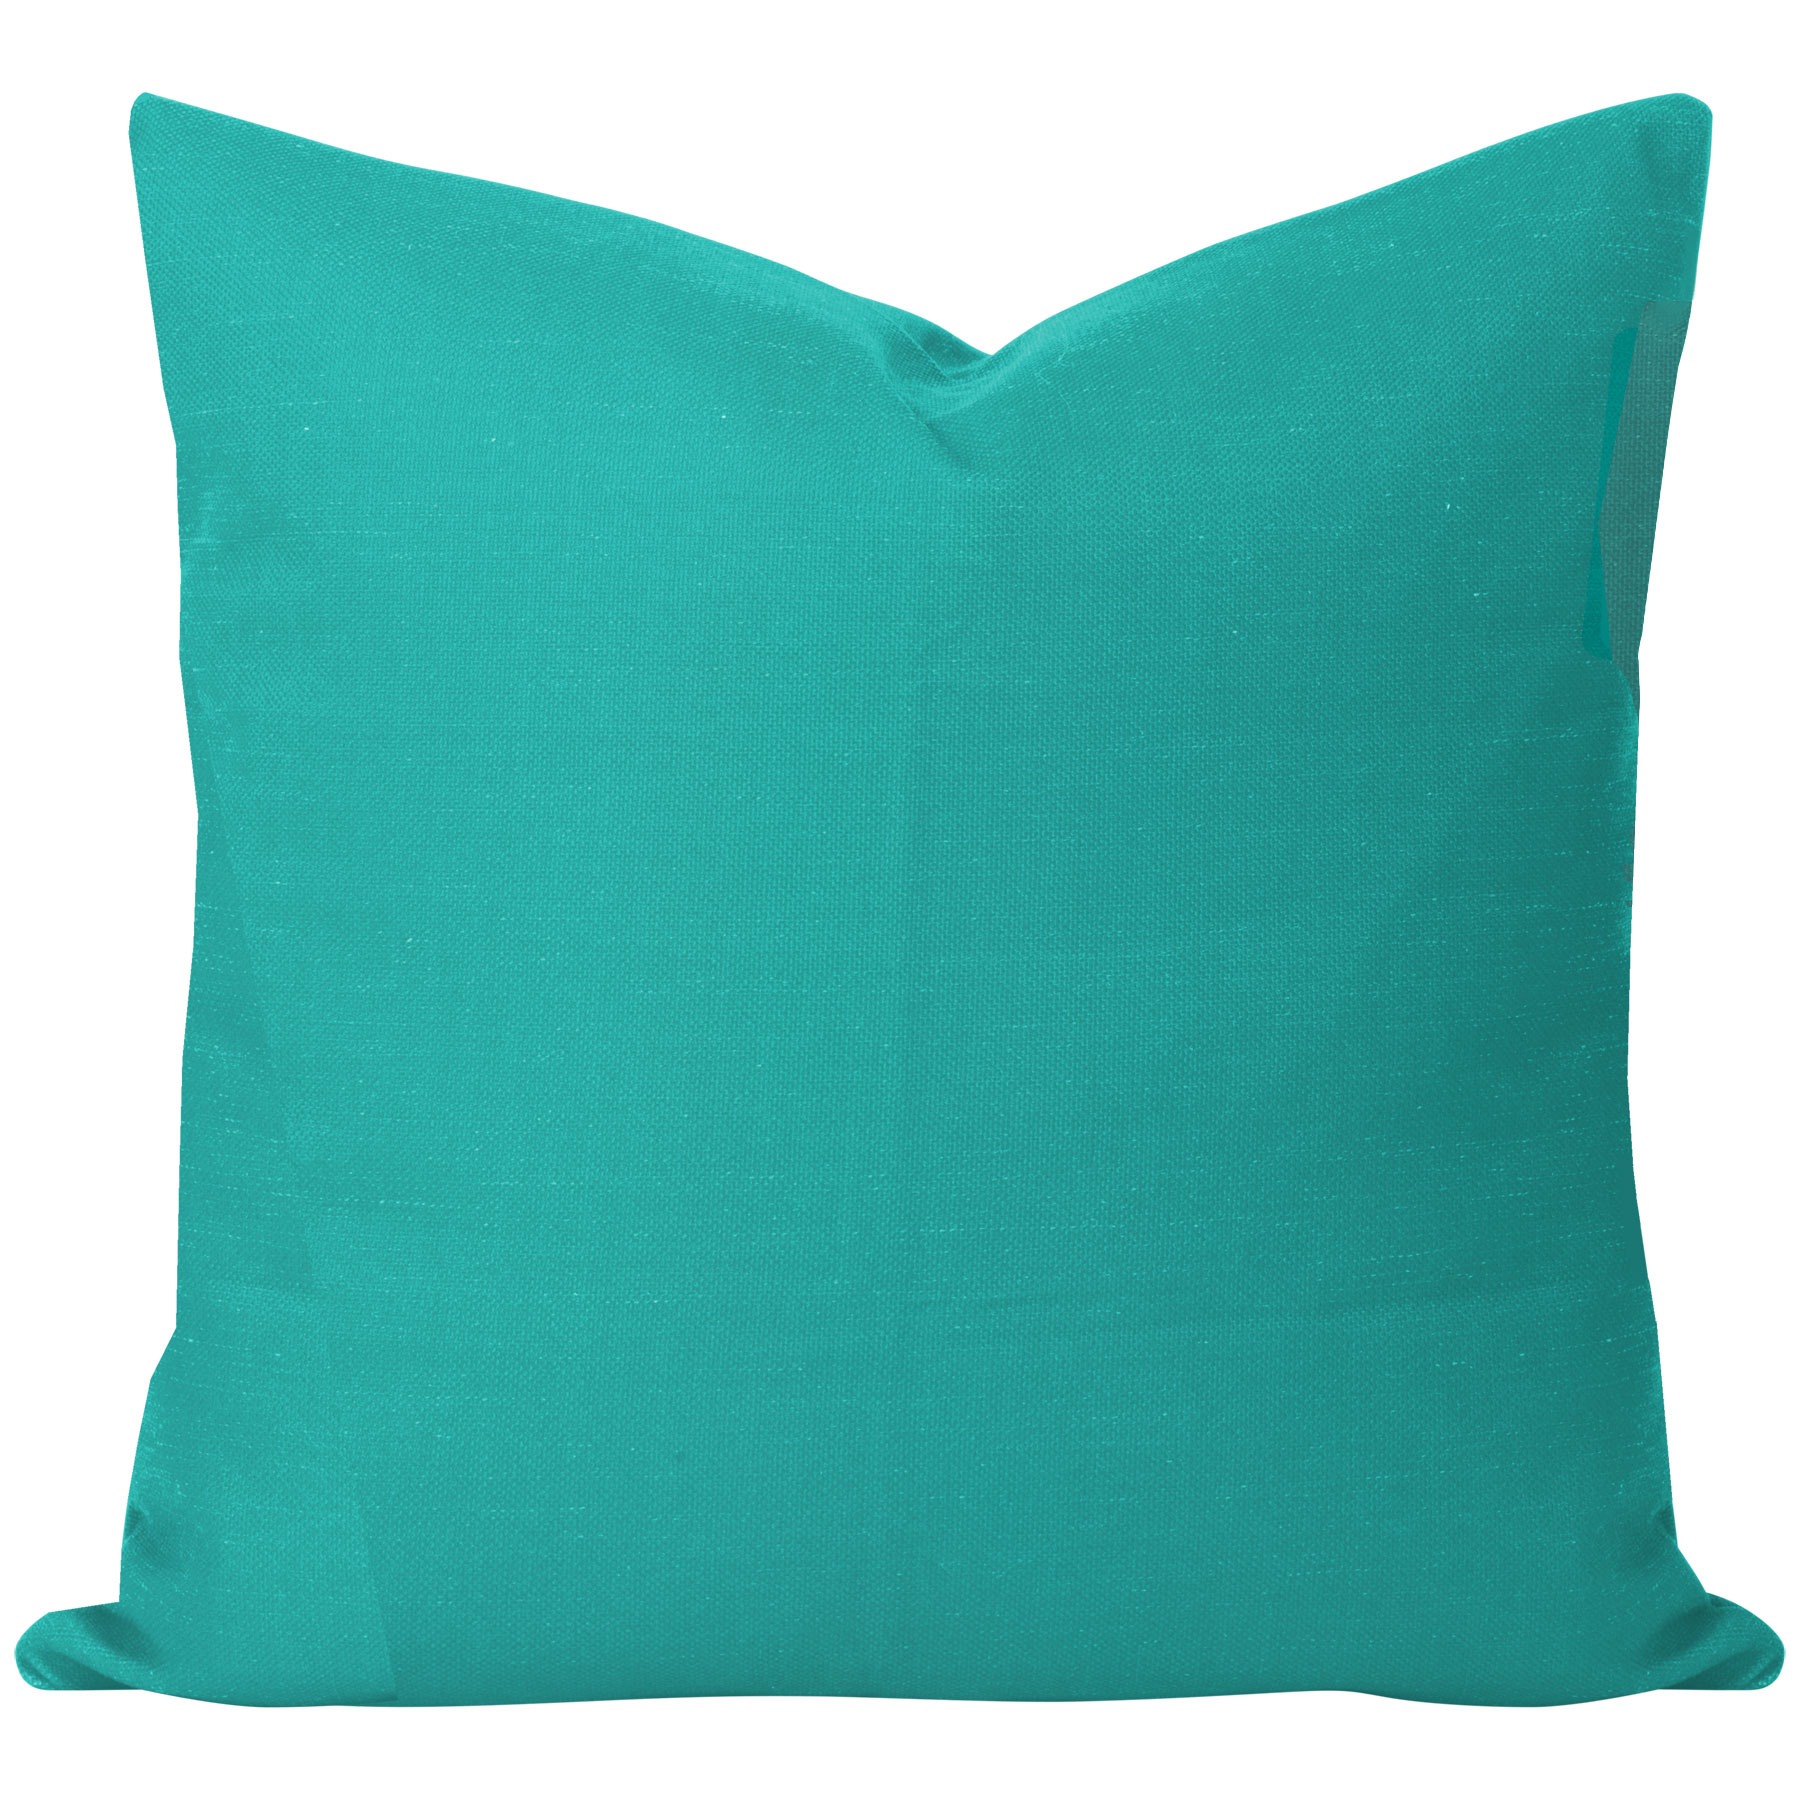 Georgia-Plain-Turquoise-Cushion